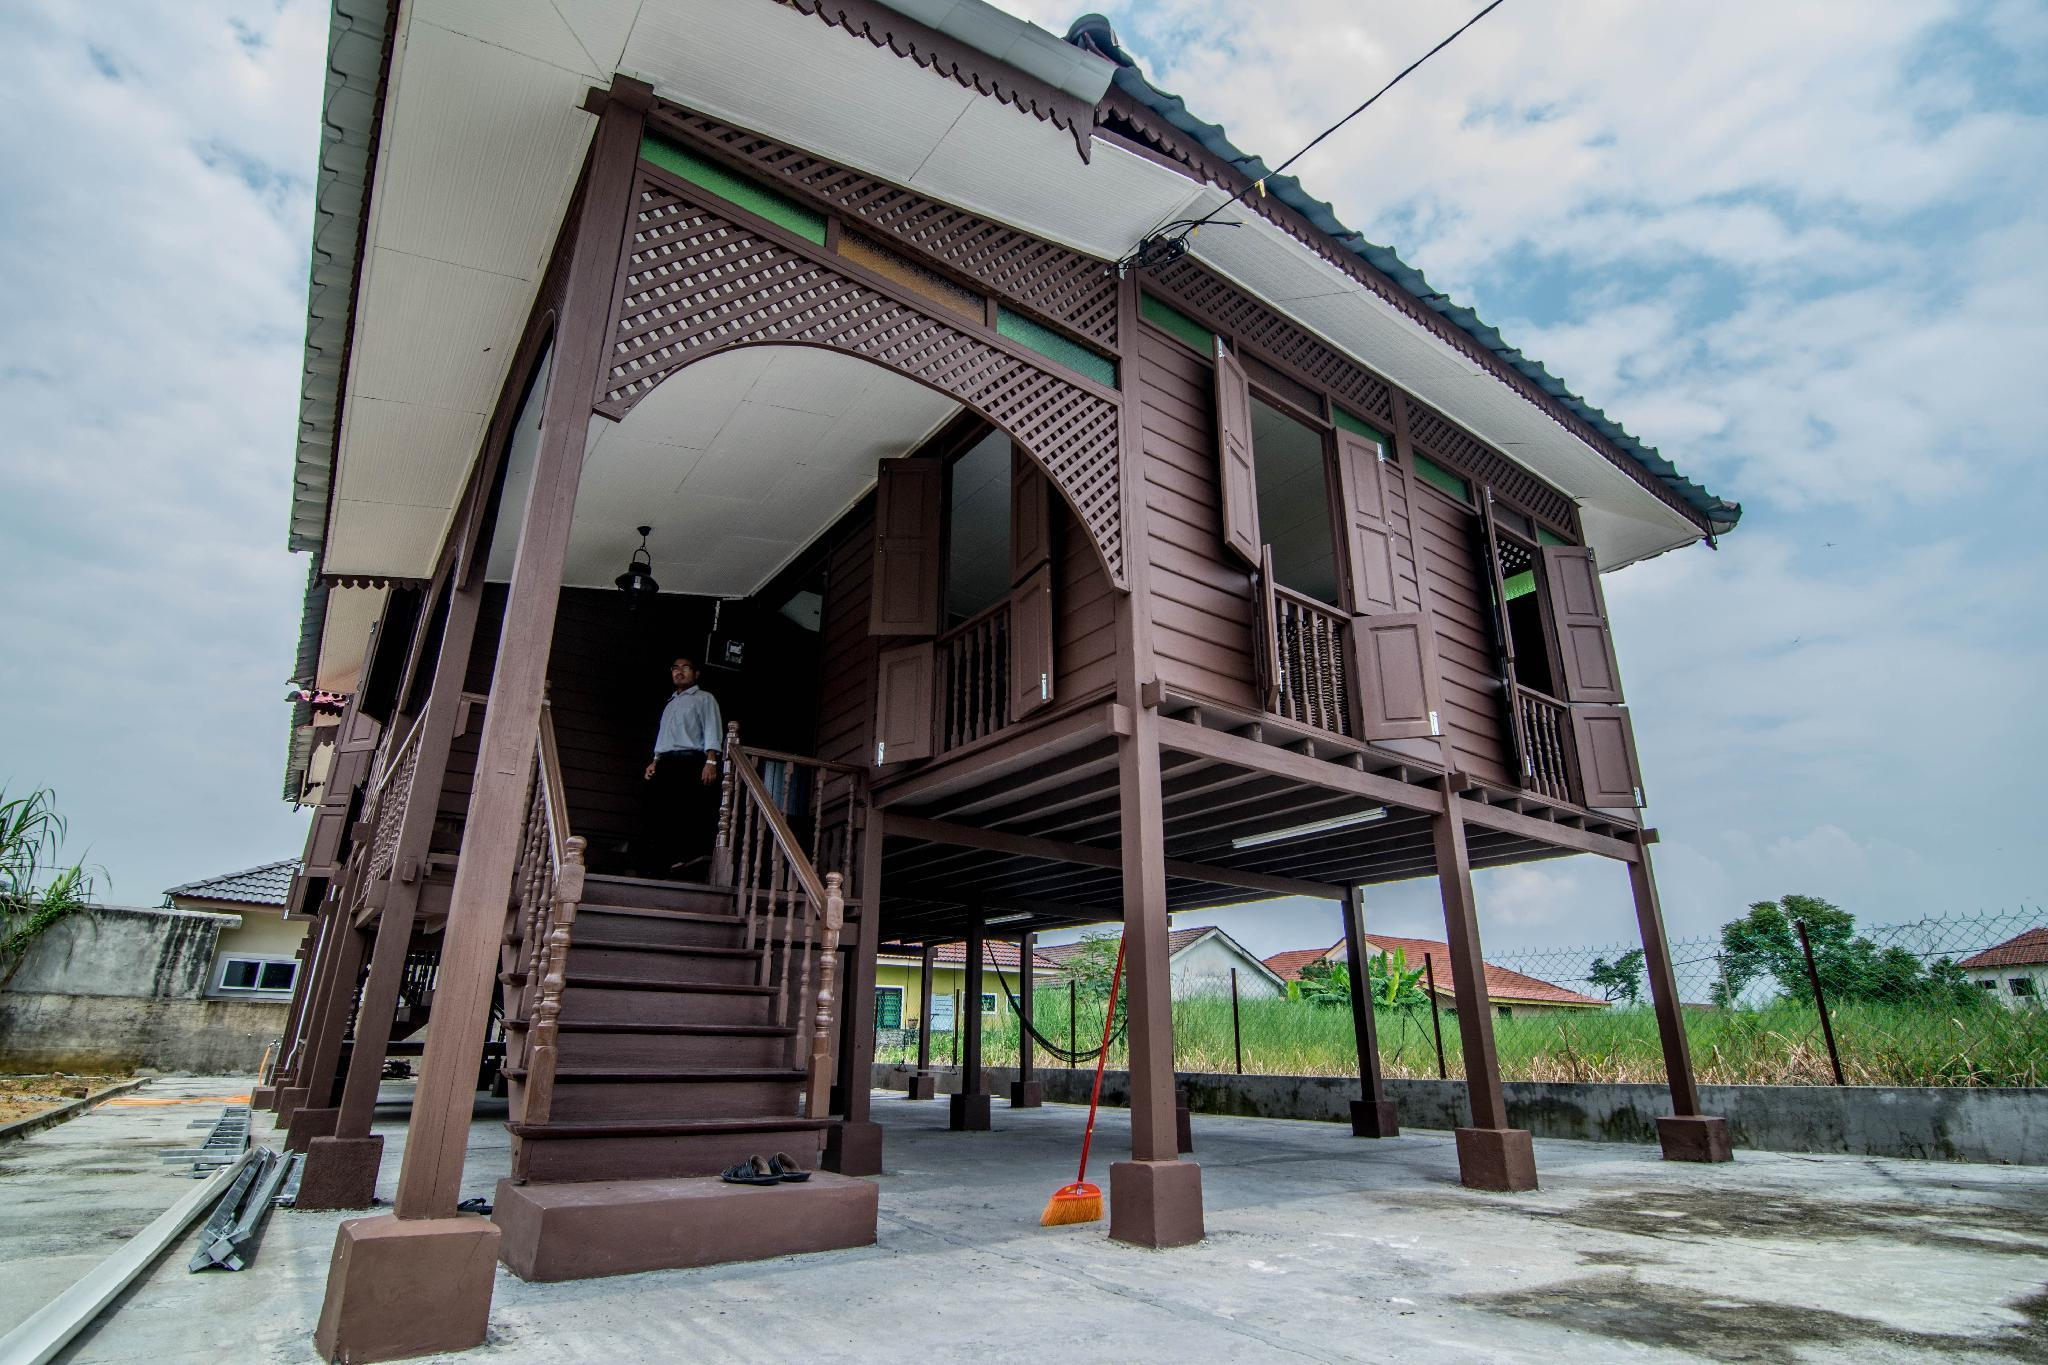 Perak Traditional House Near Lost World Of Tambun